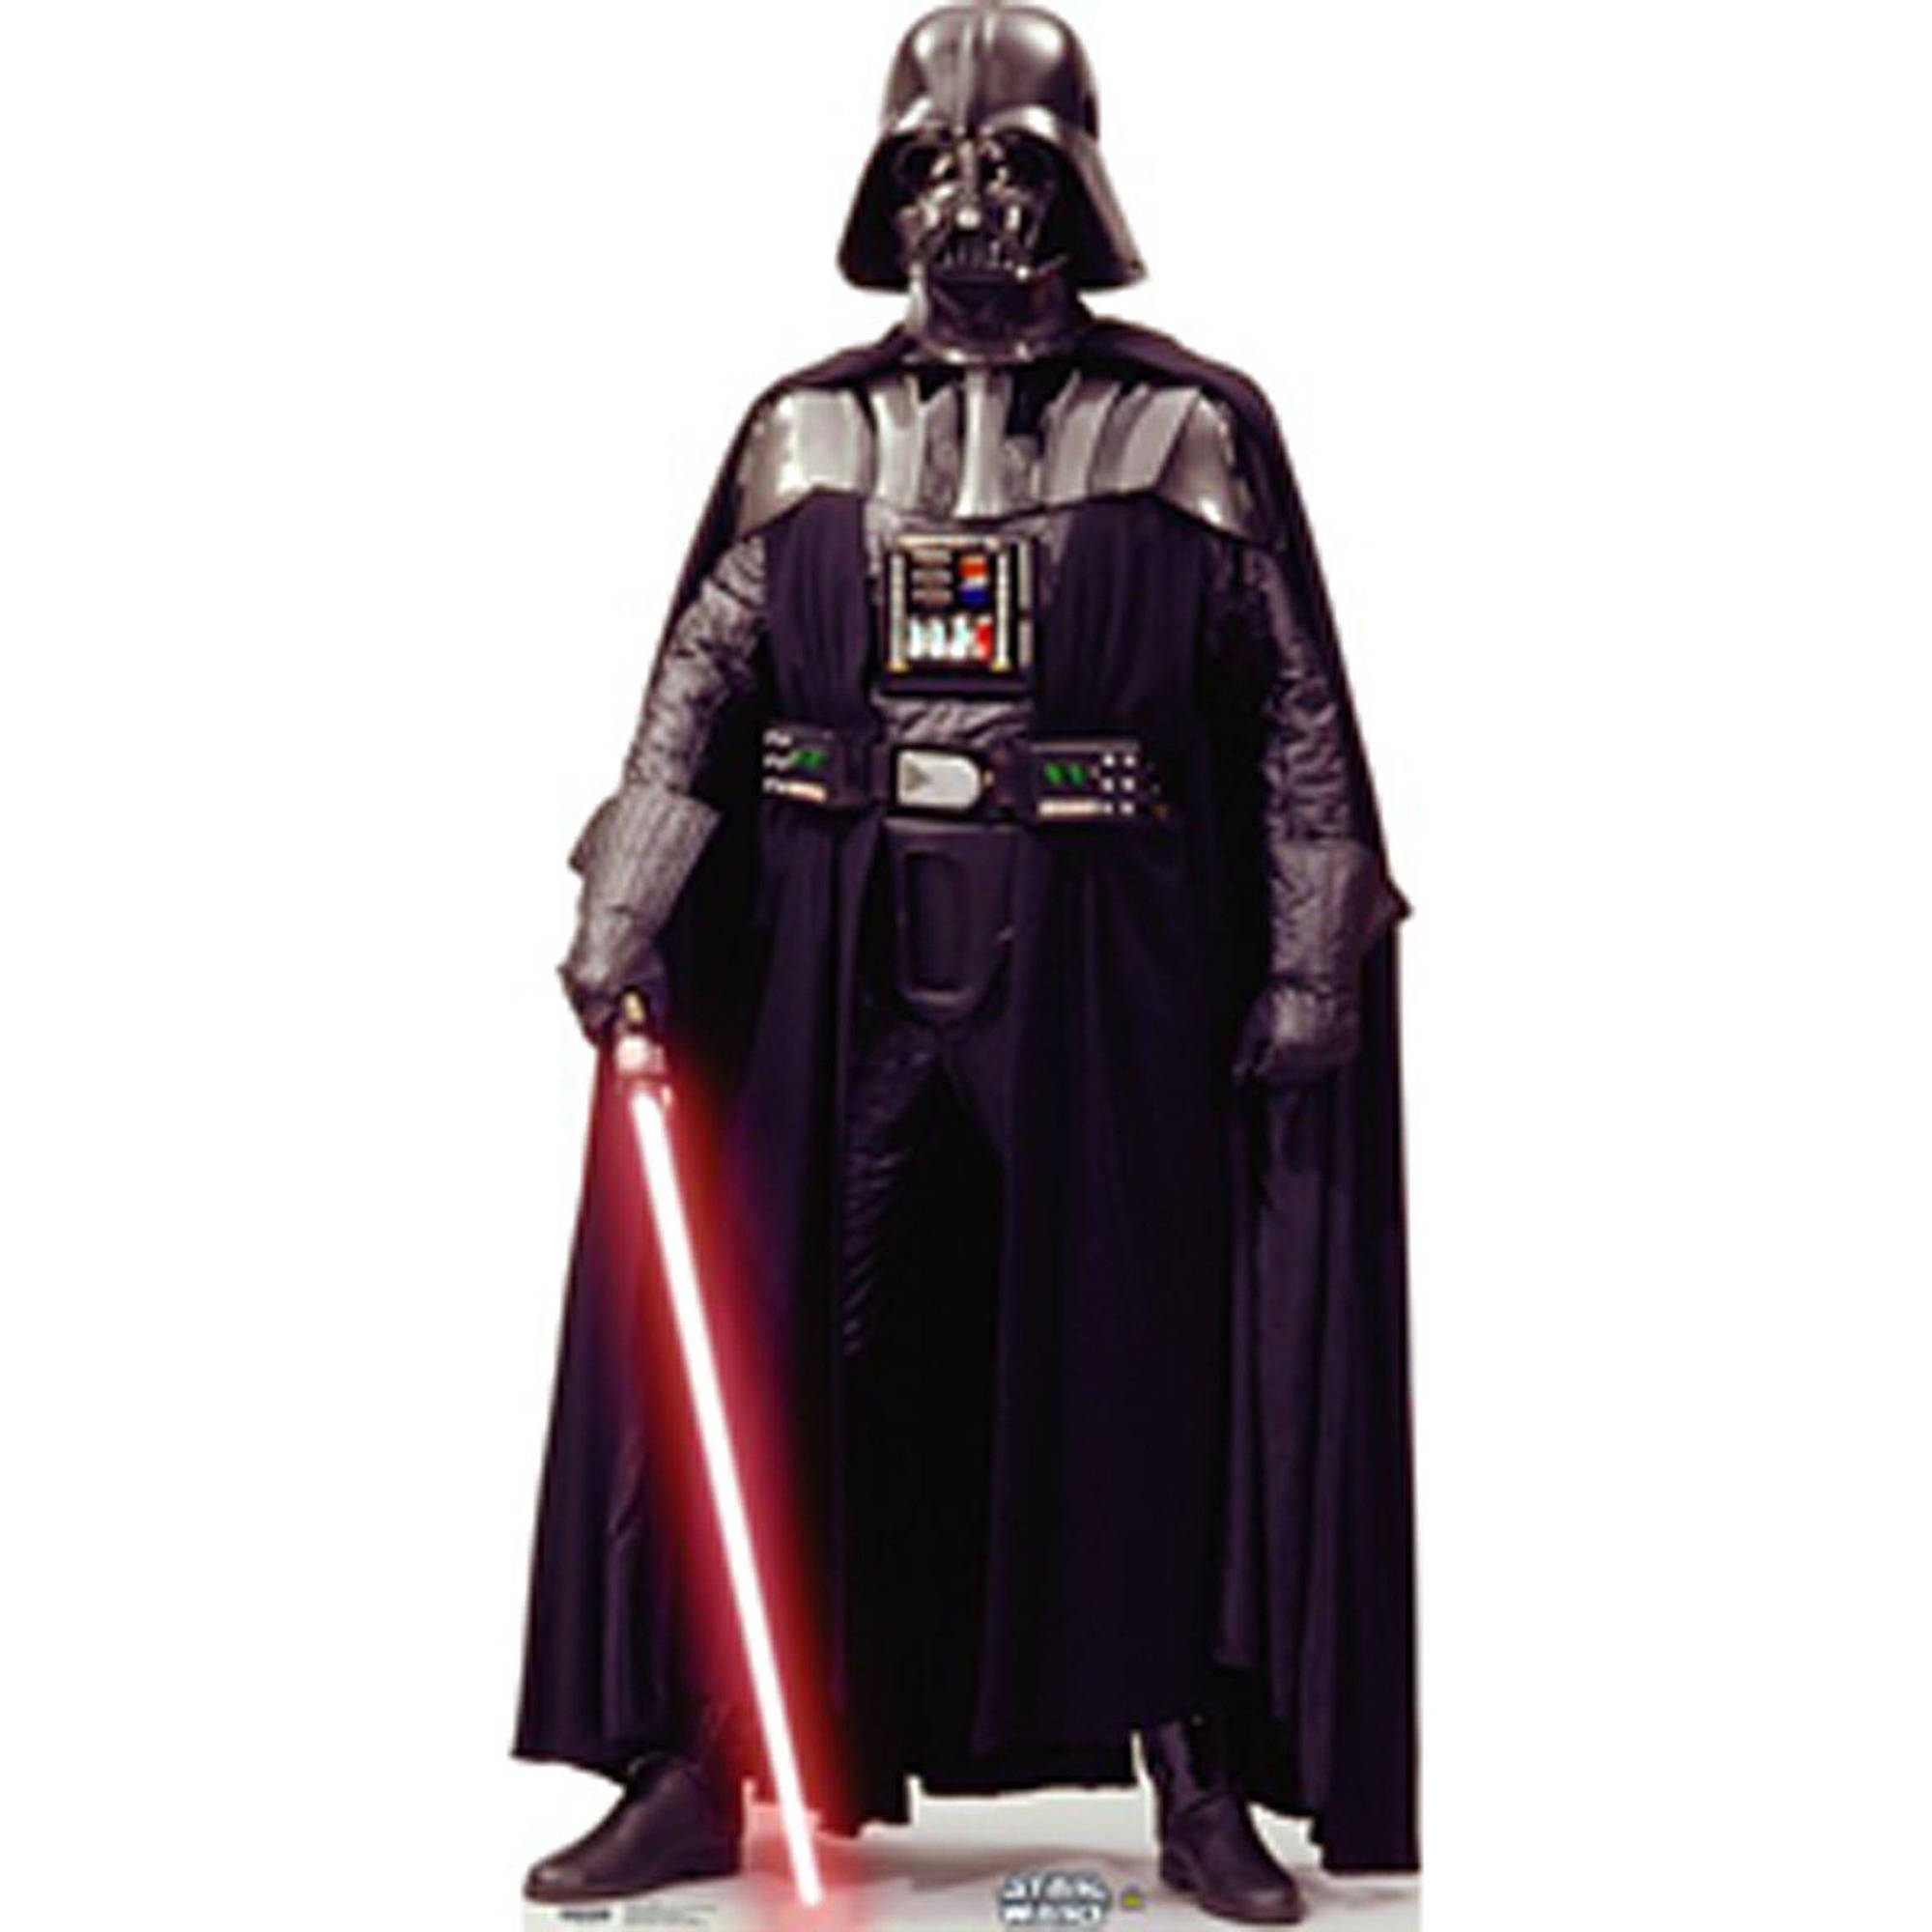 Advanced Graphics 161039 Darth Vader Standup